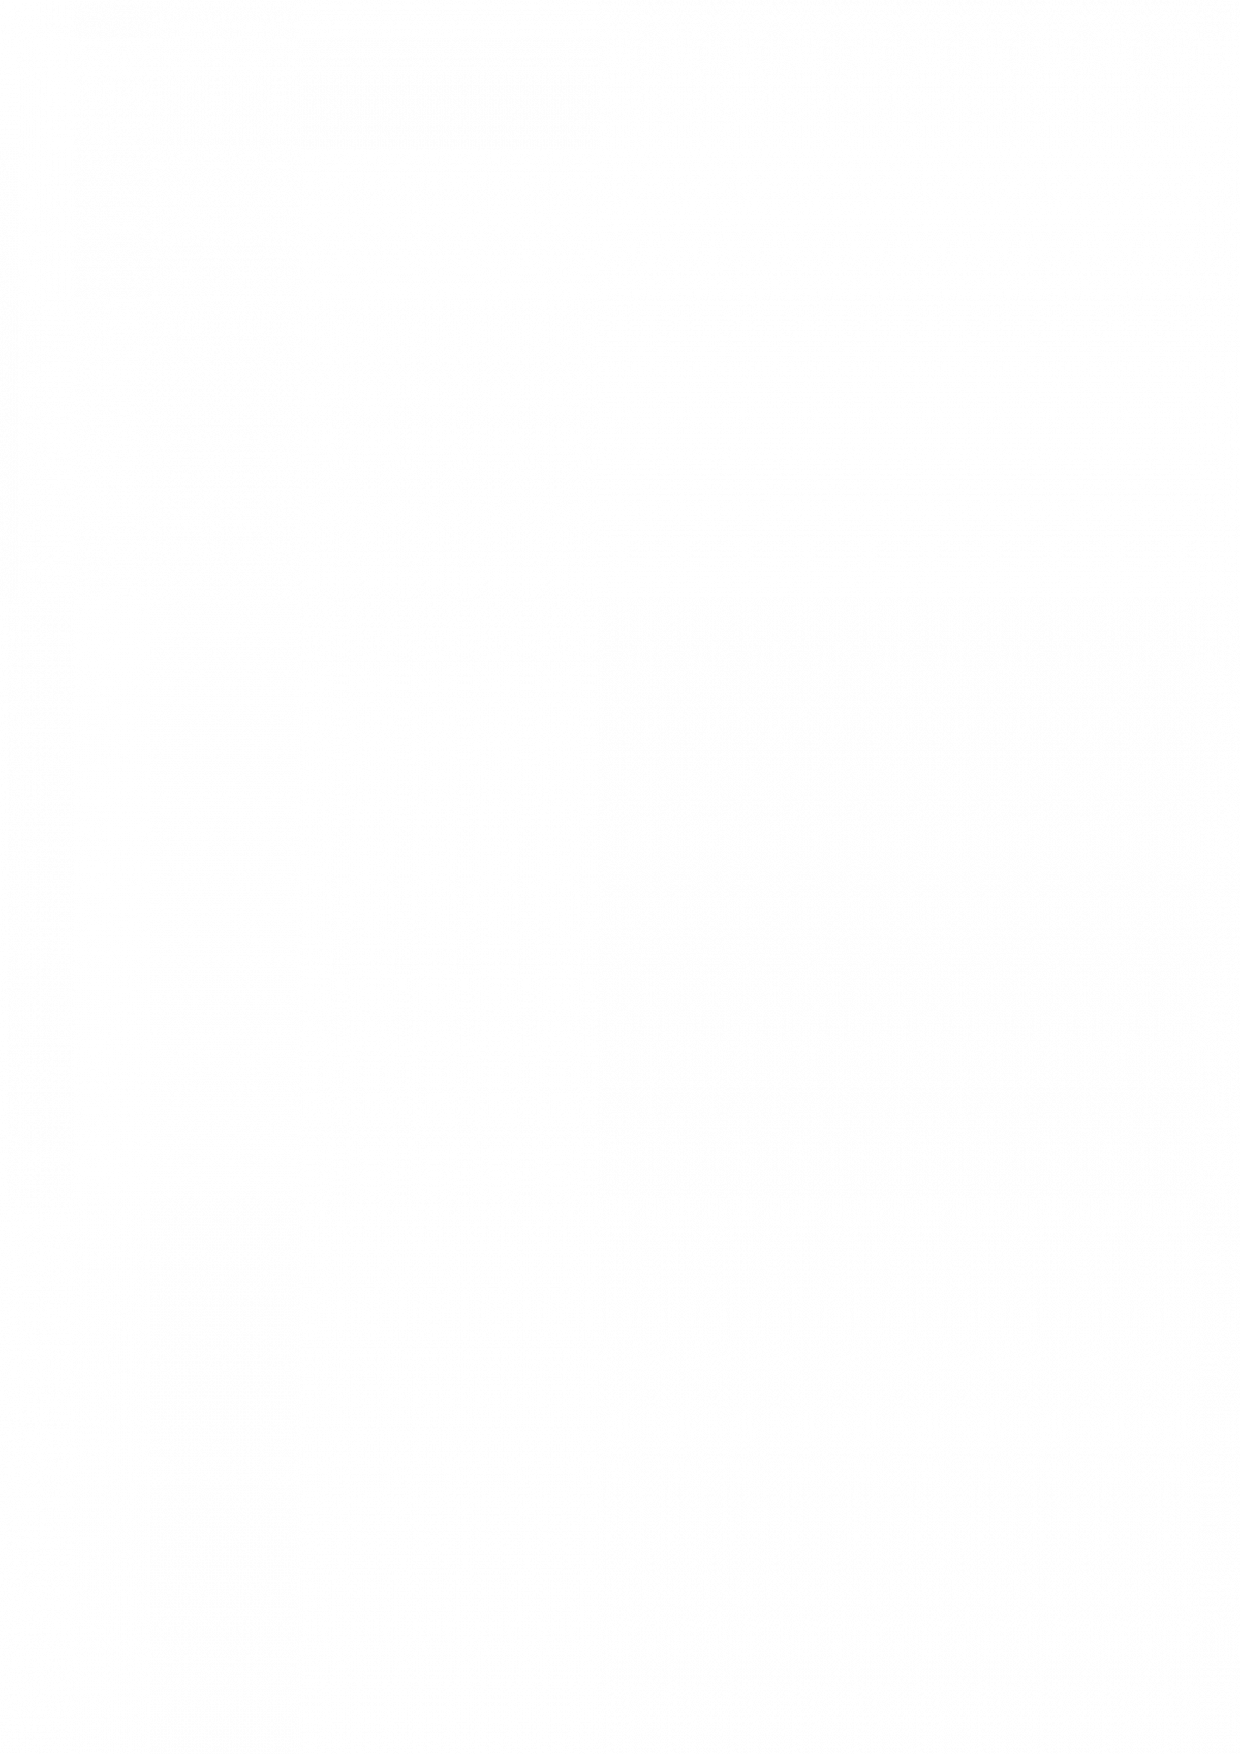 Haustfrí